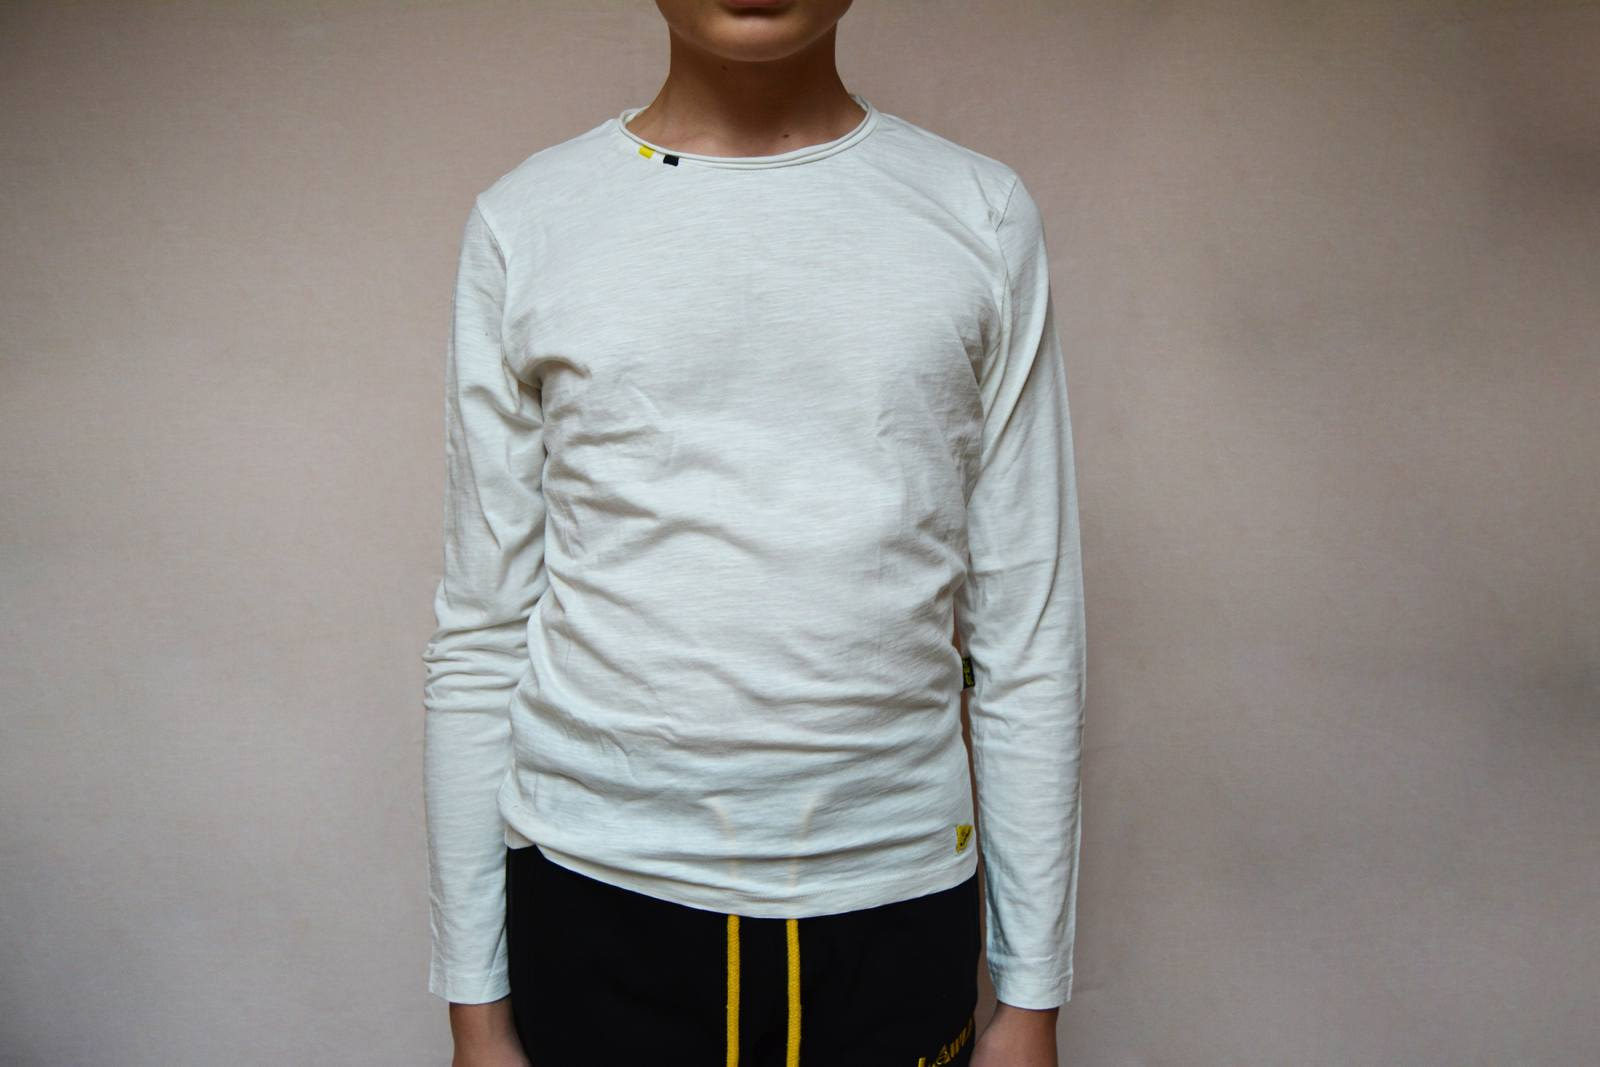 T shirt manica lunga uomo bianca, logo